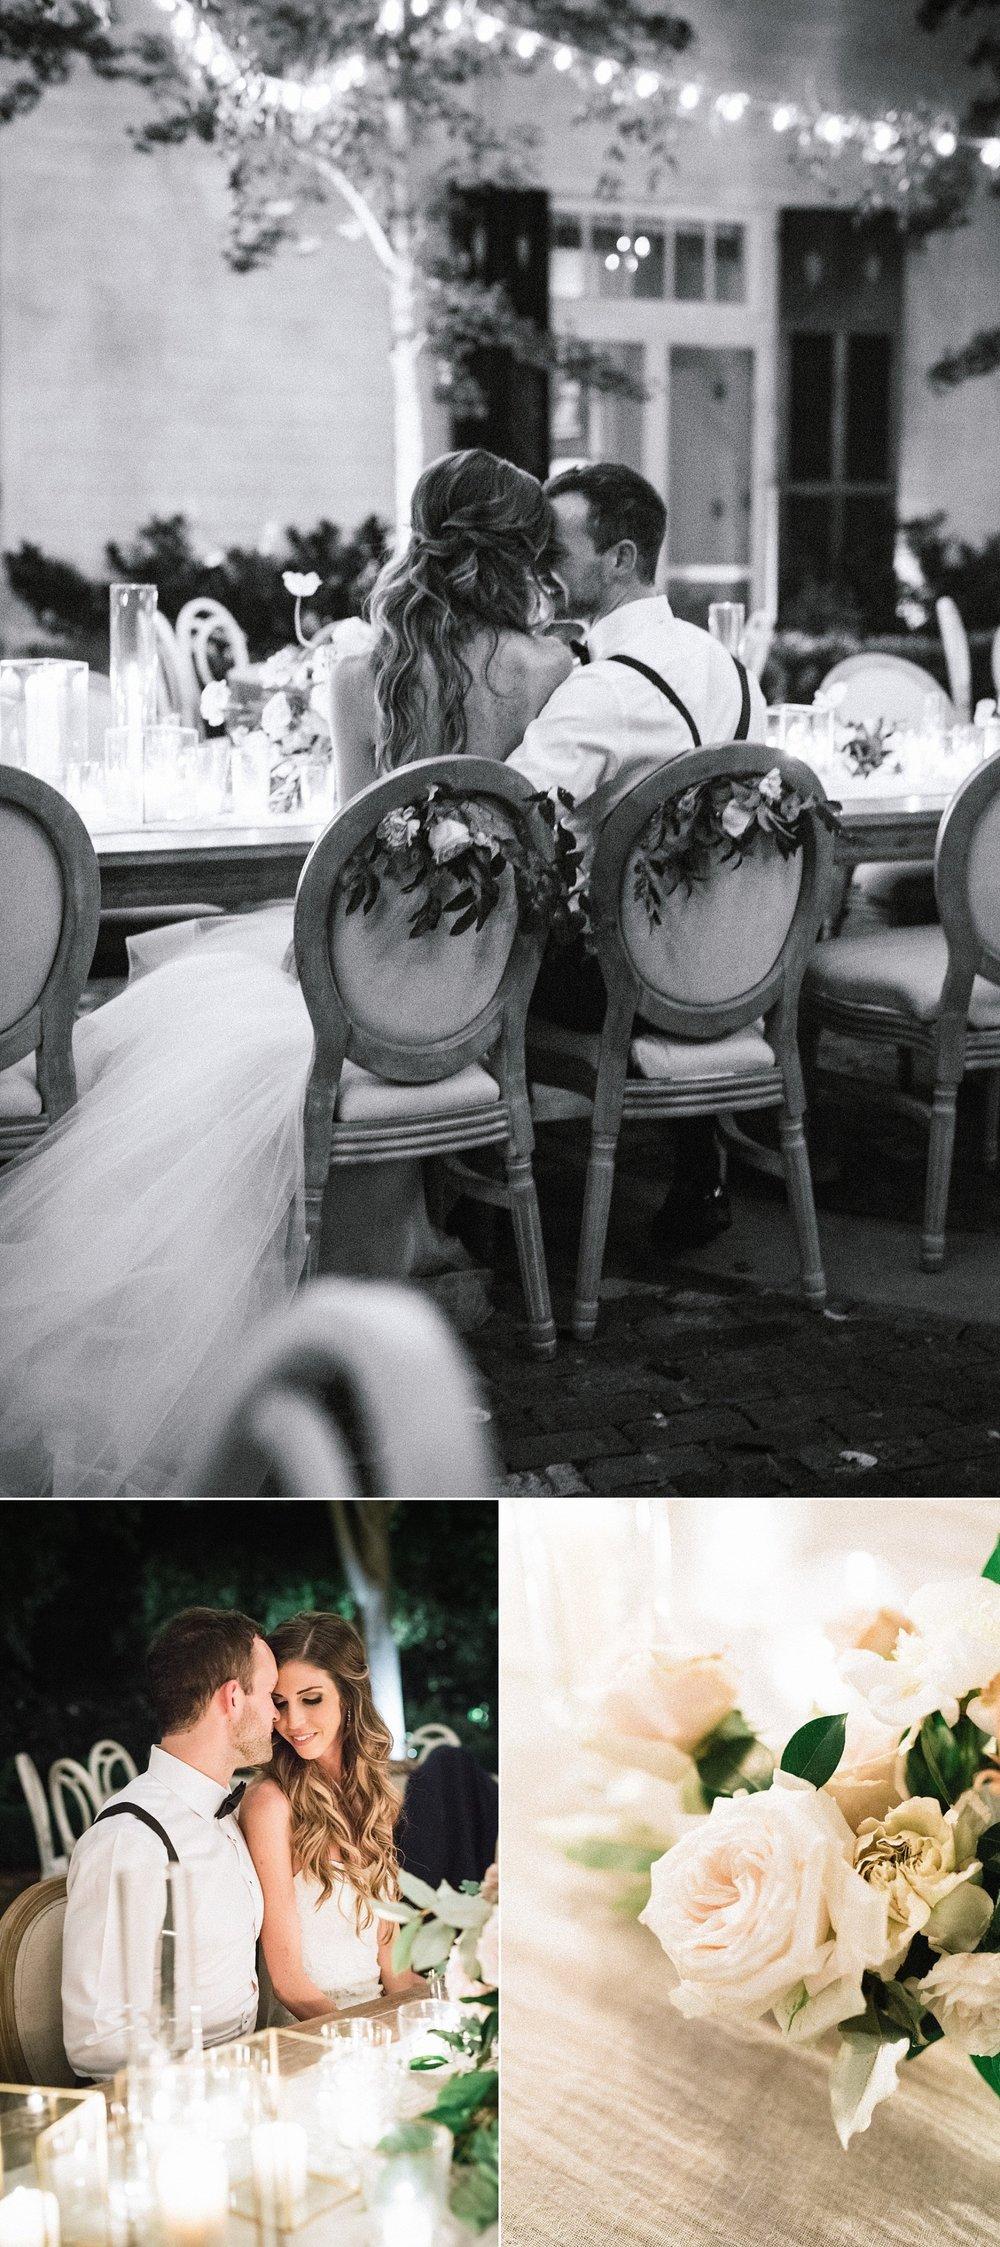 dukemansionweddingcharlotteweddingvideographers